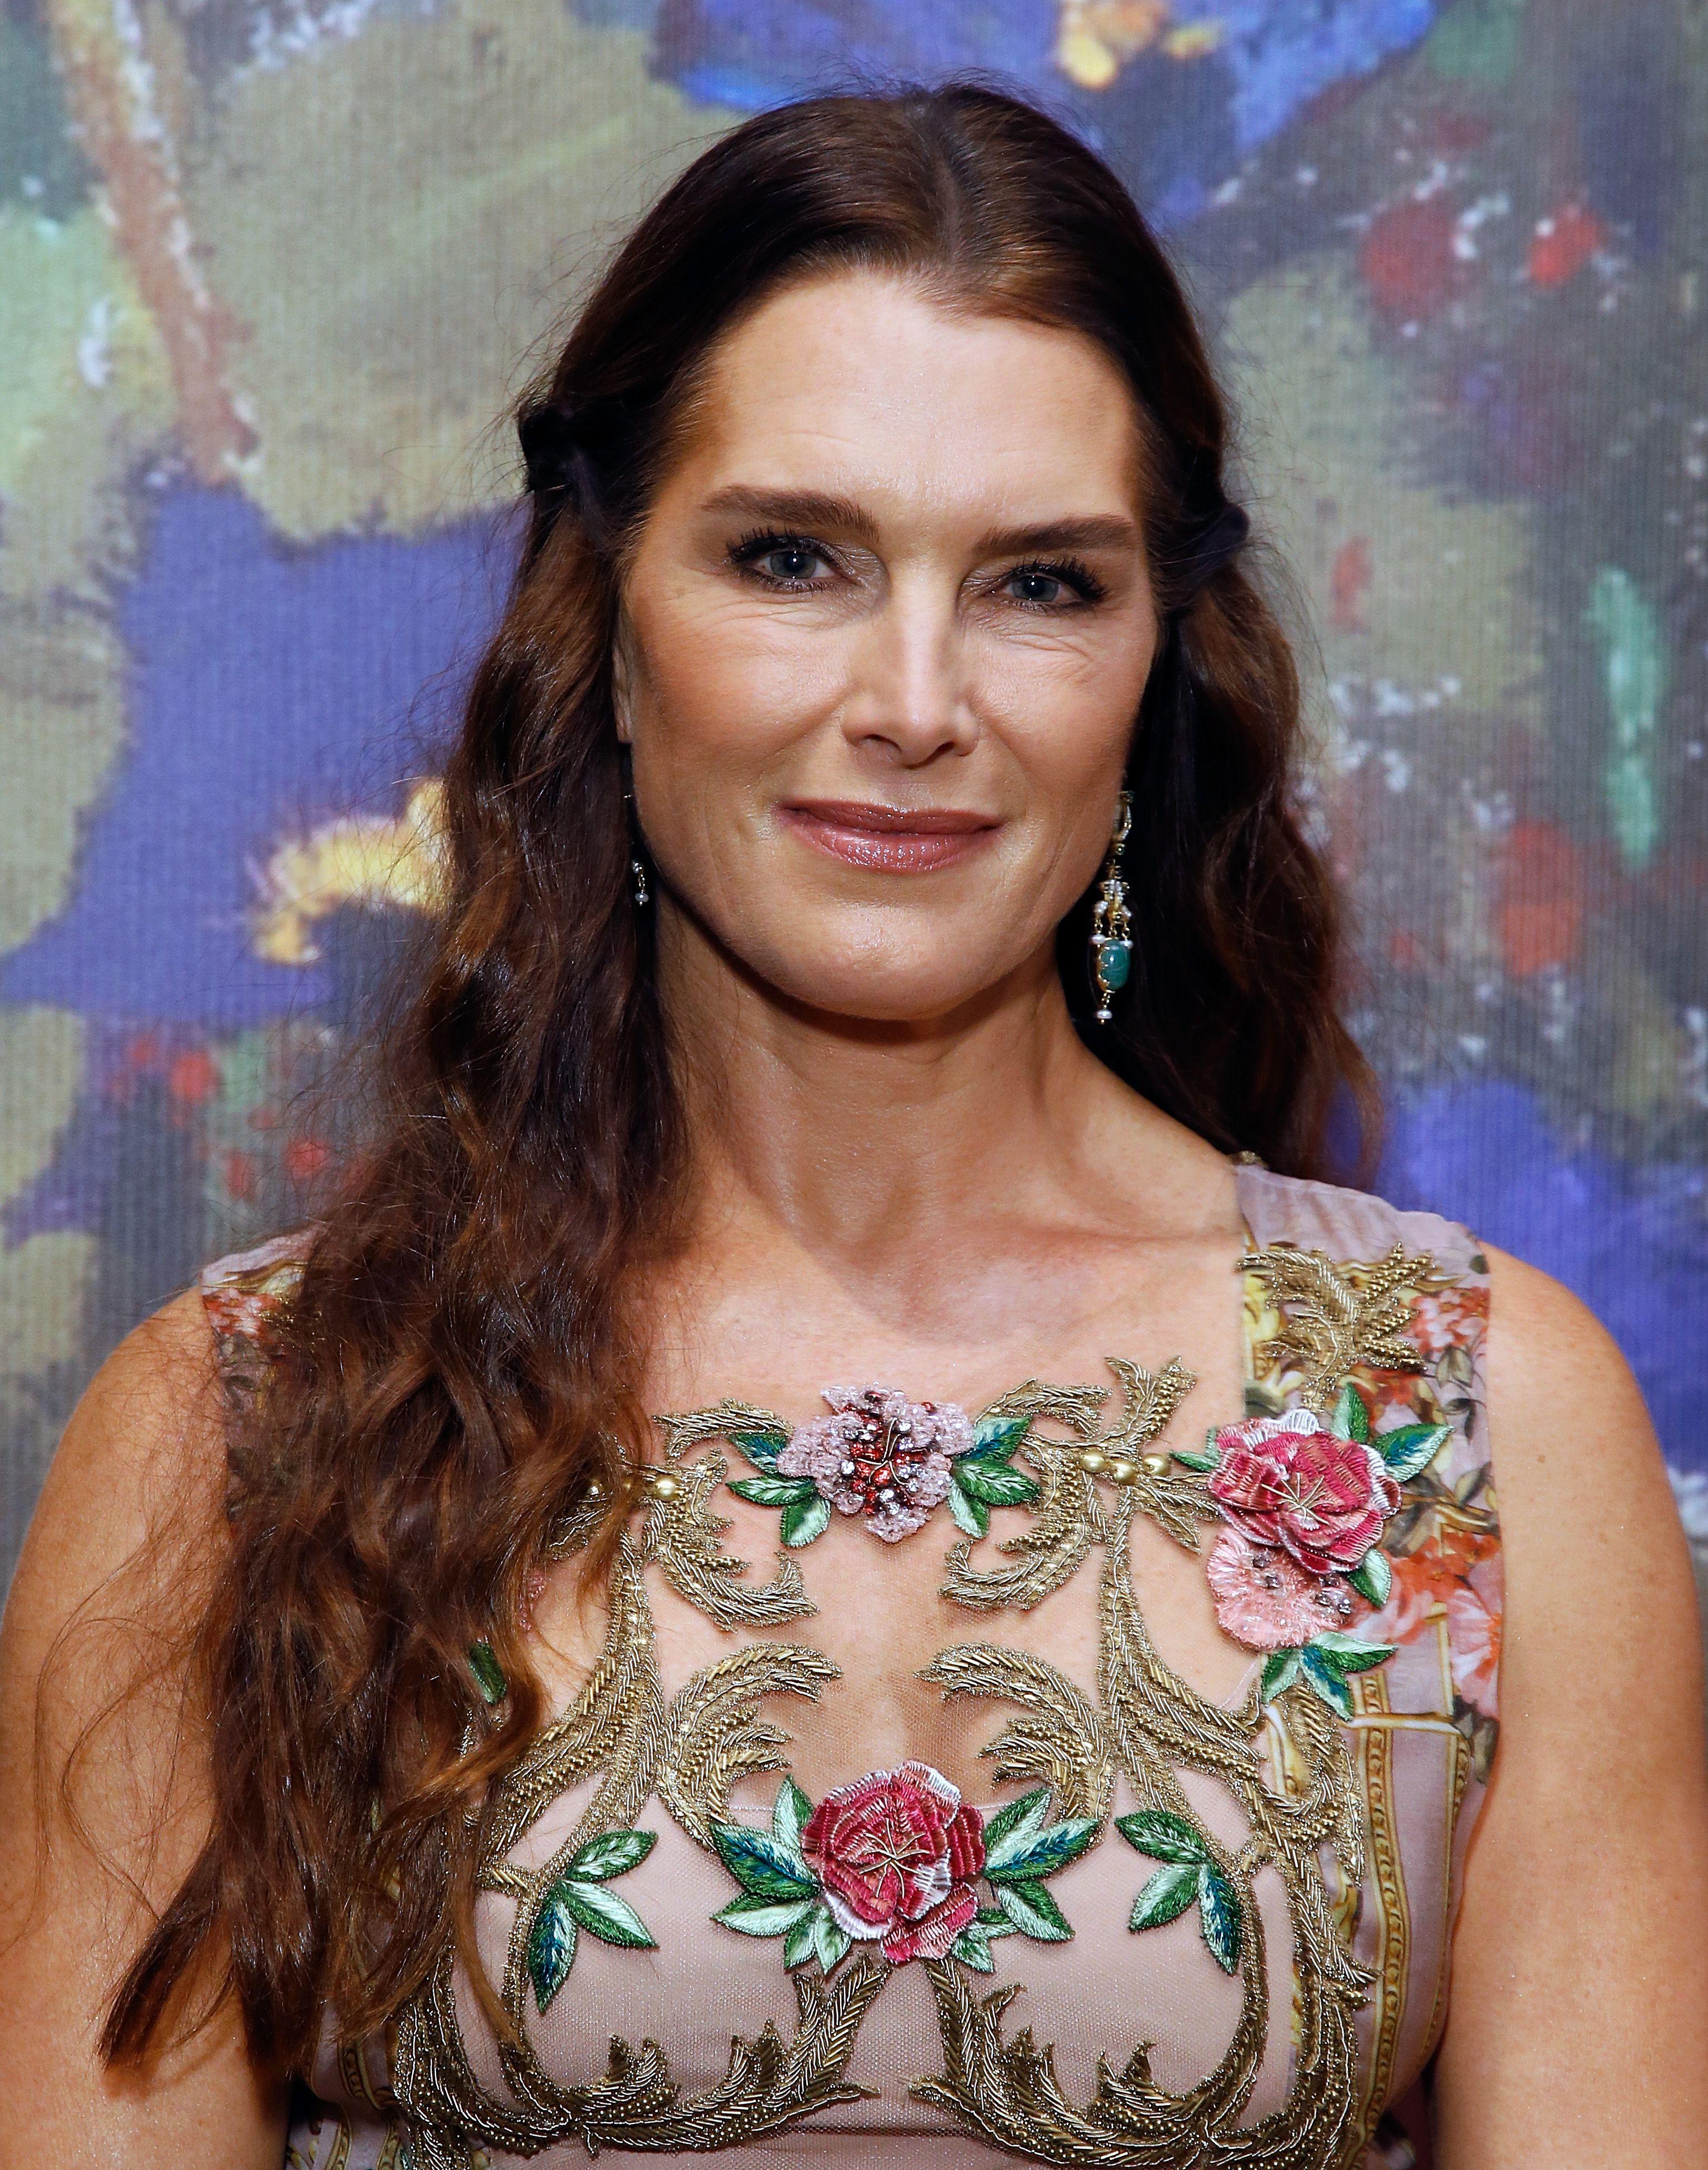 35 Celebrities Who Have Had Plastic Surgery - Celebrities